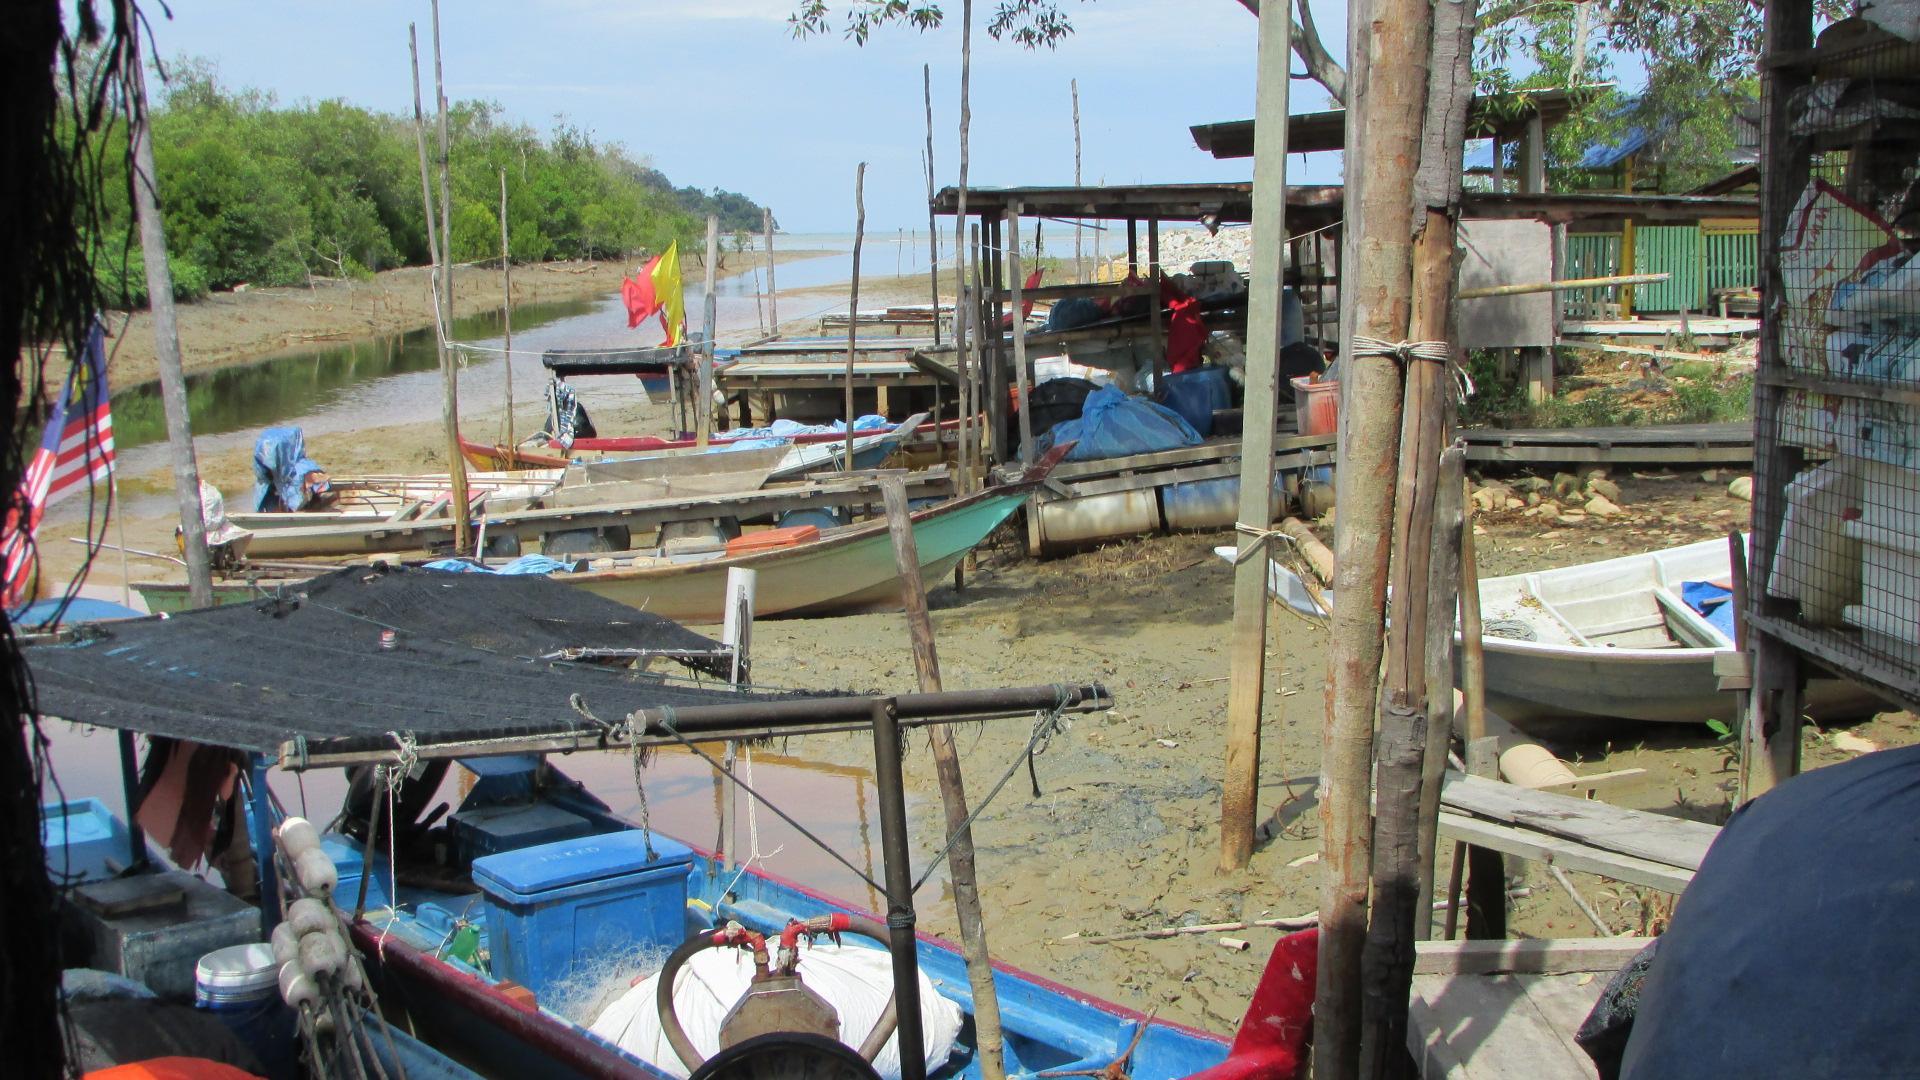 Fishermen jetty in Kampung Sungai Batu, Pantai Remis, Perak | SAM